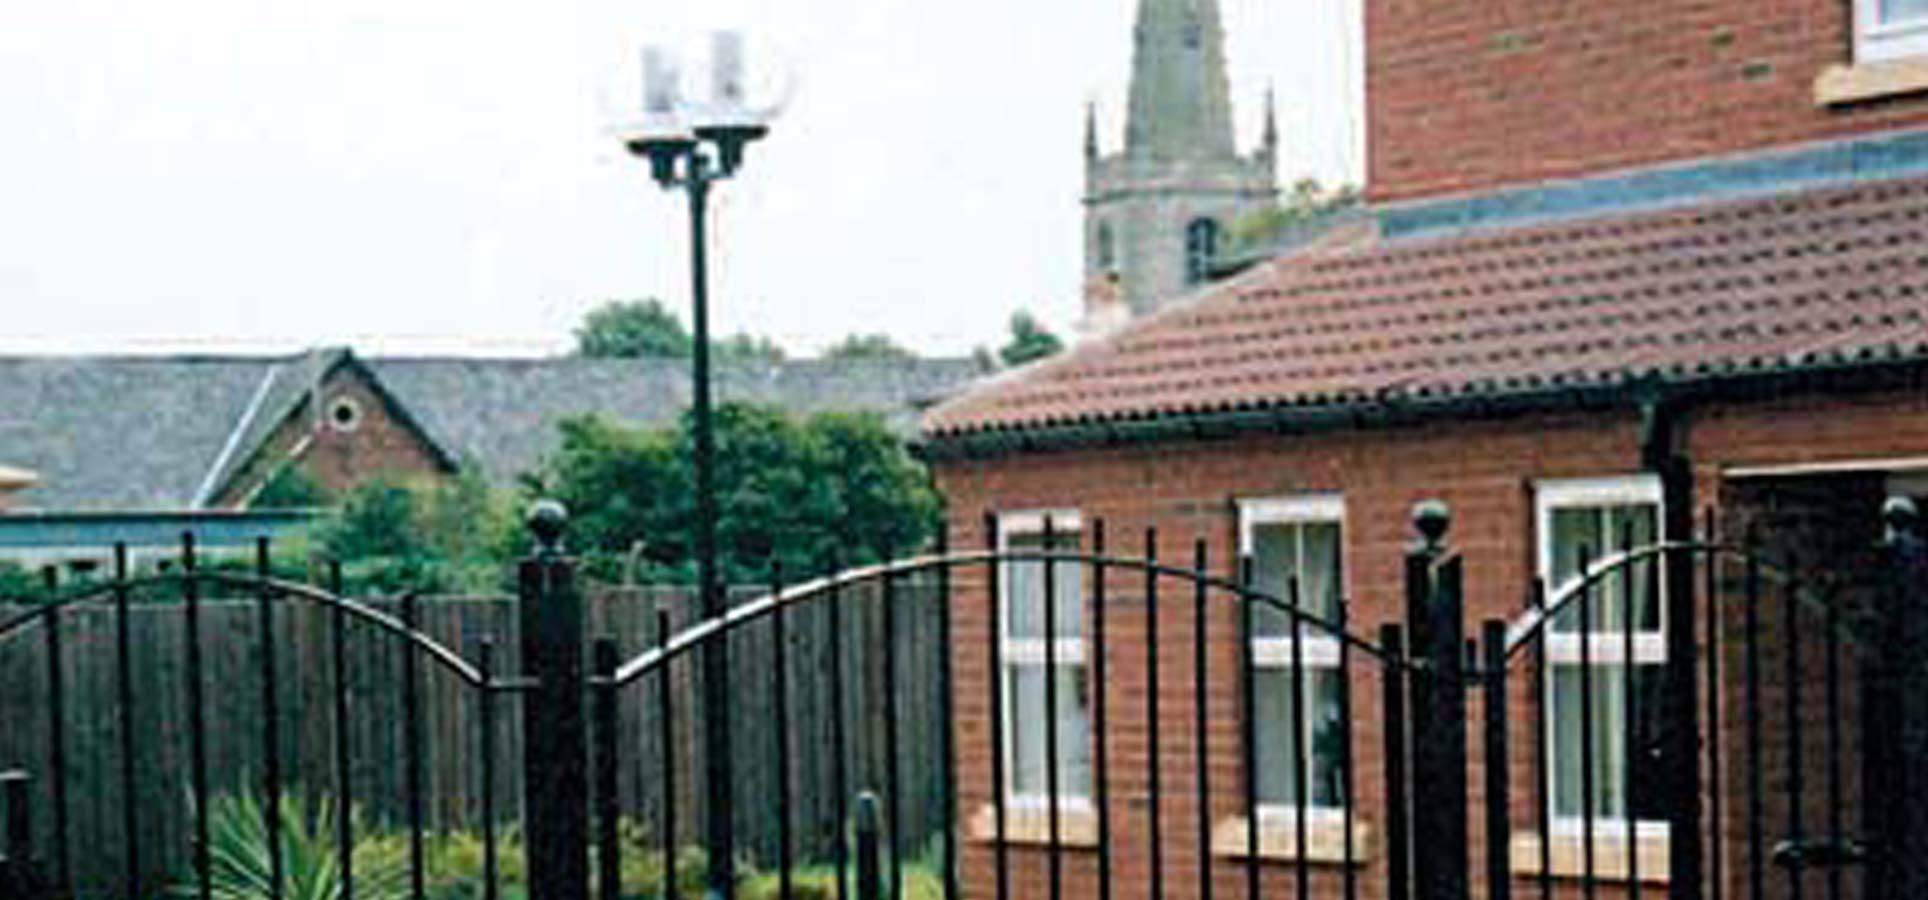 Sheltered Accommodation, Balderton, Jessops Construction Ltd